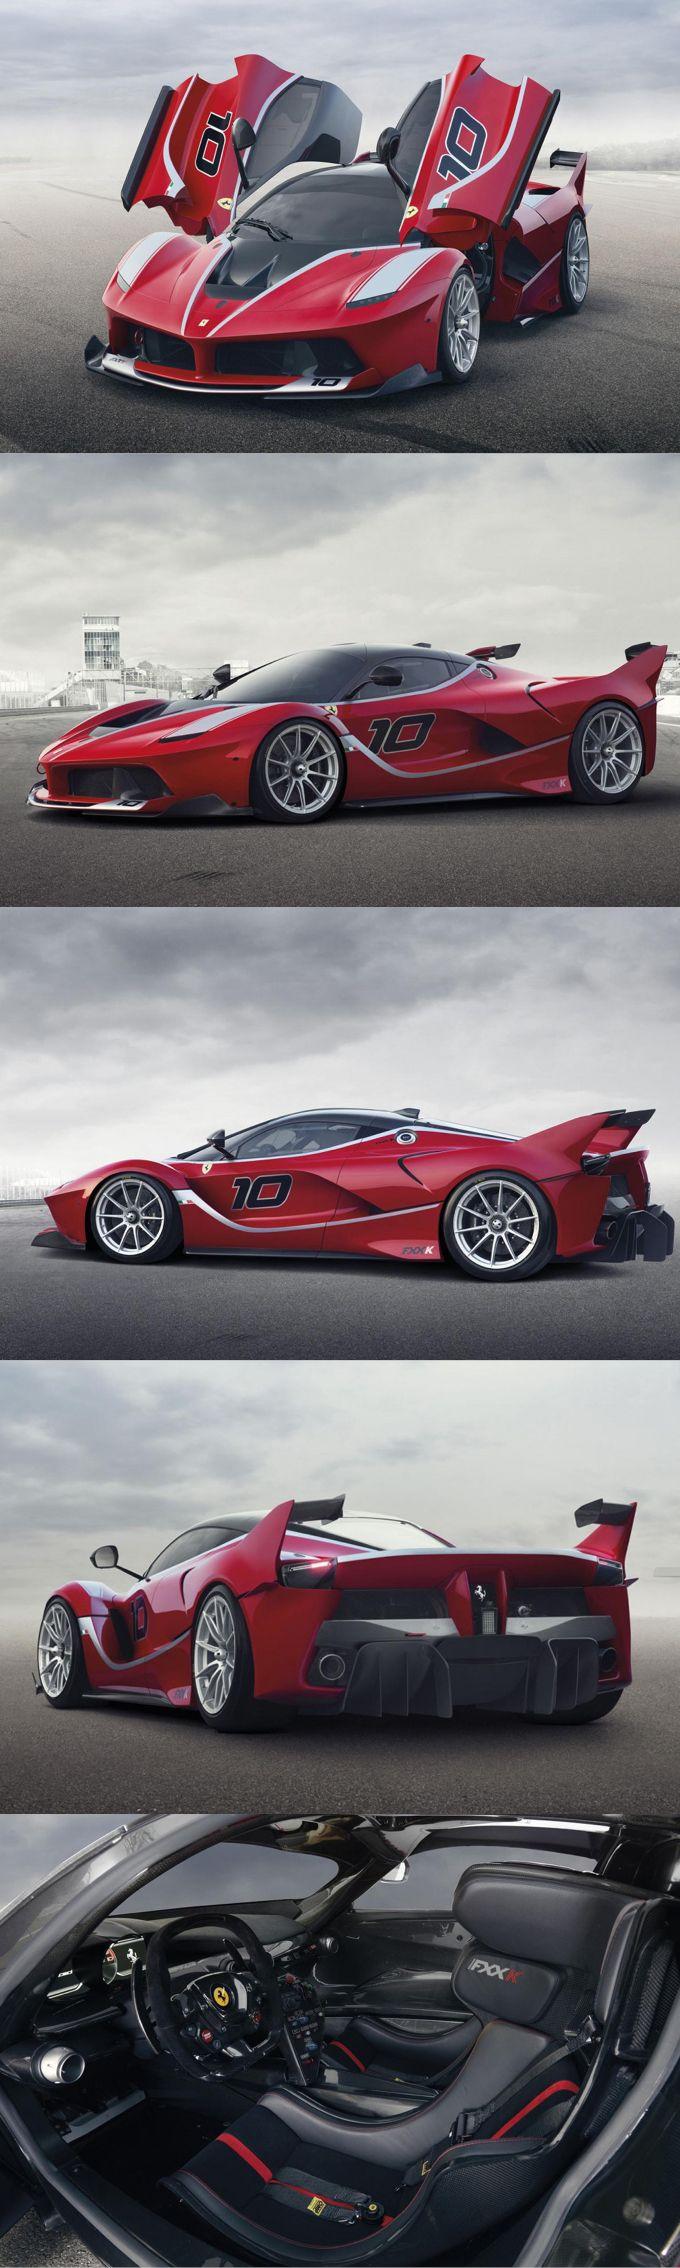 2014 ferrari fxx k 1035hp 6 3l v12 kers italy red